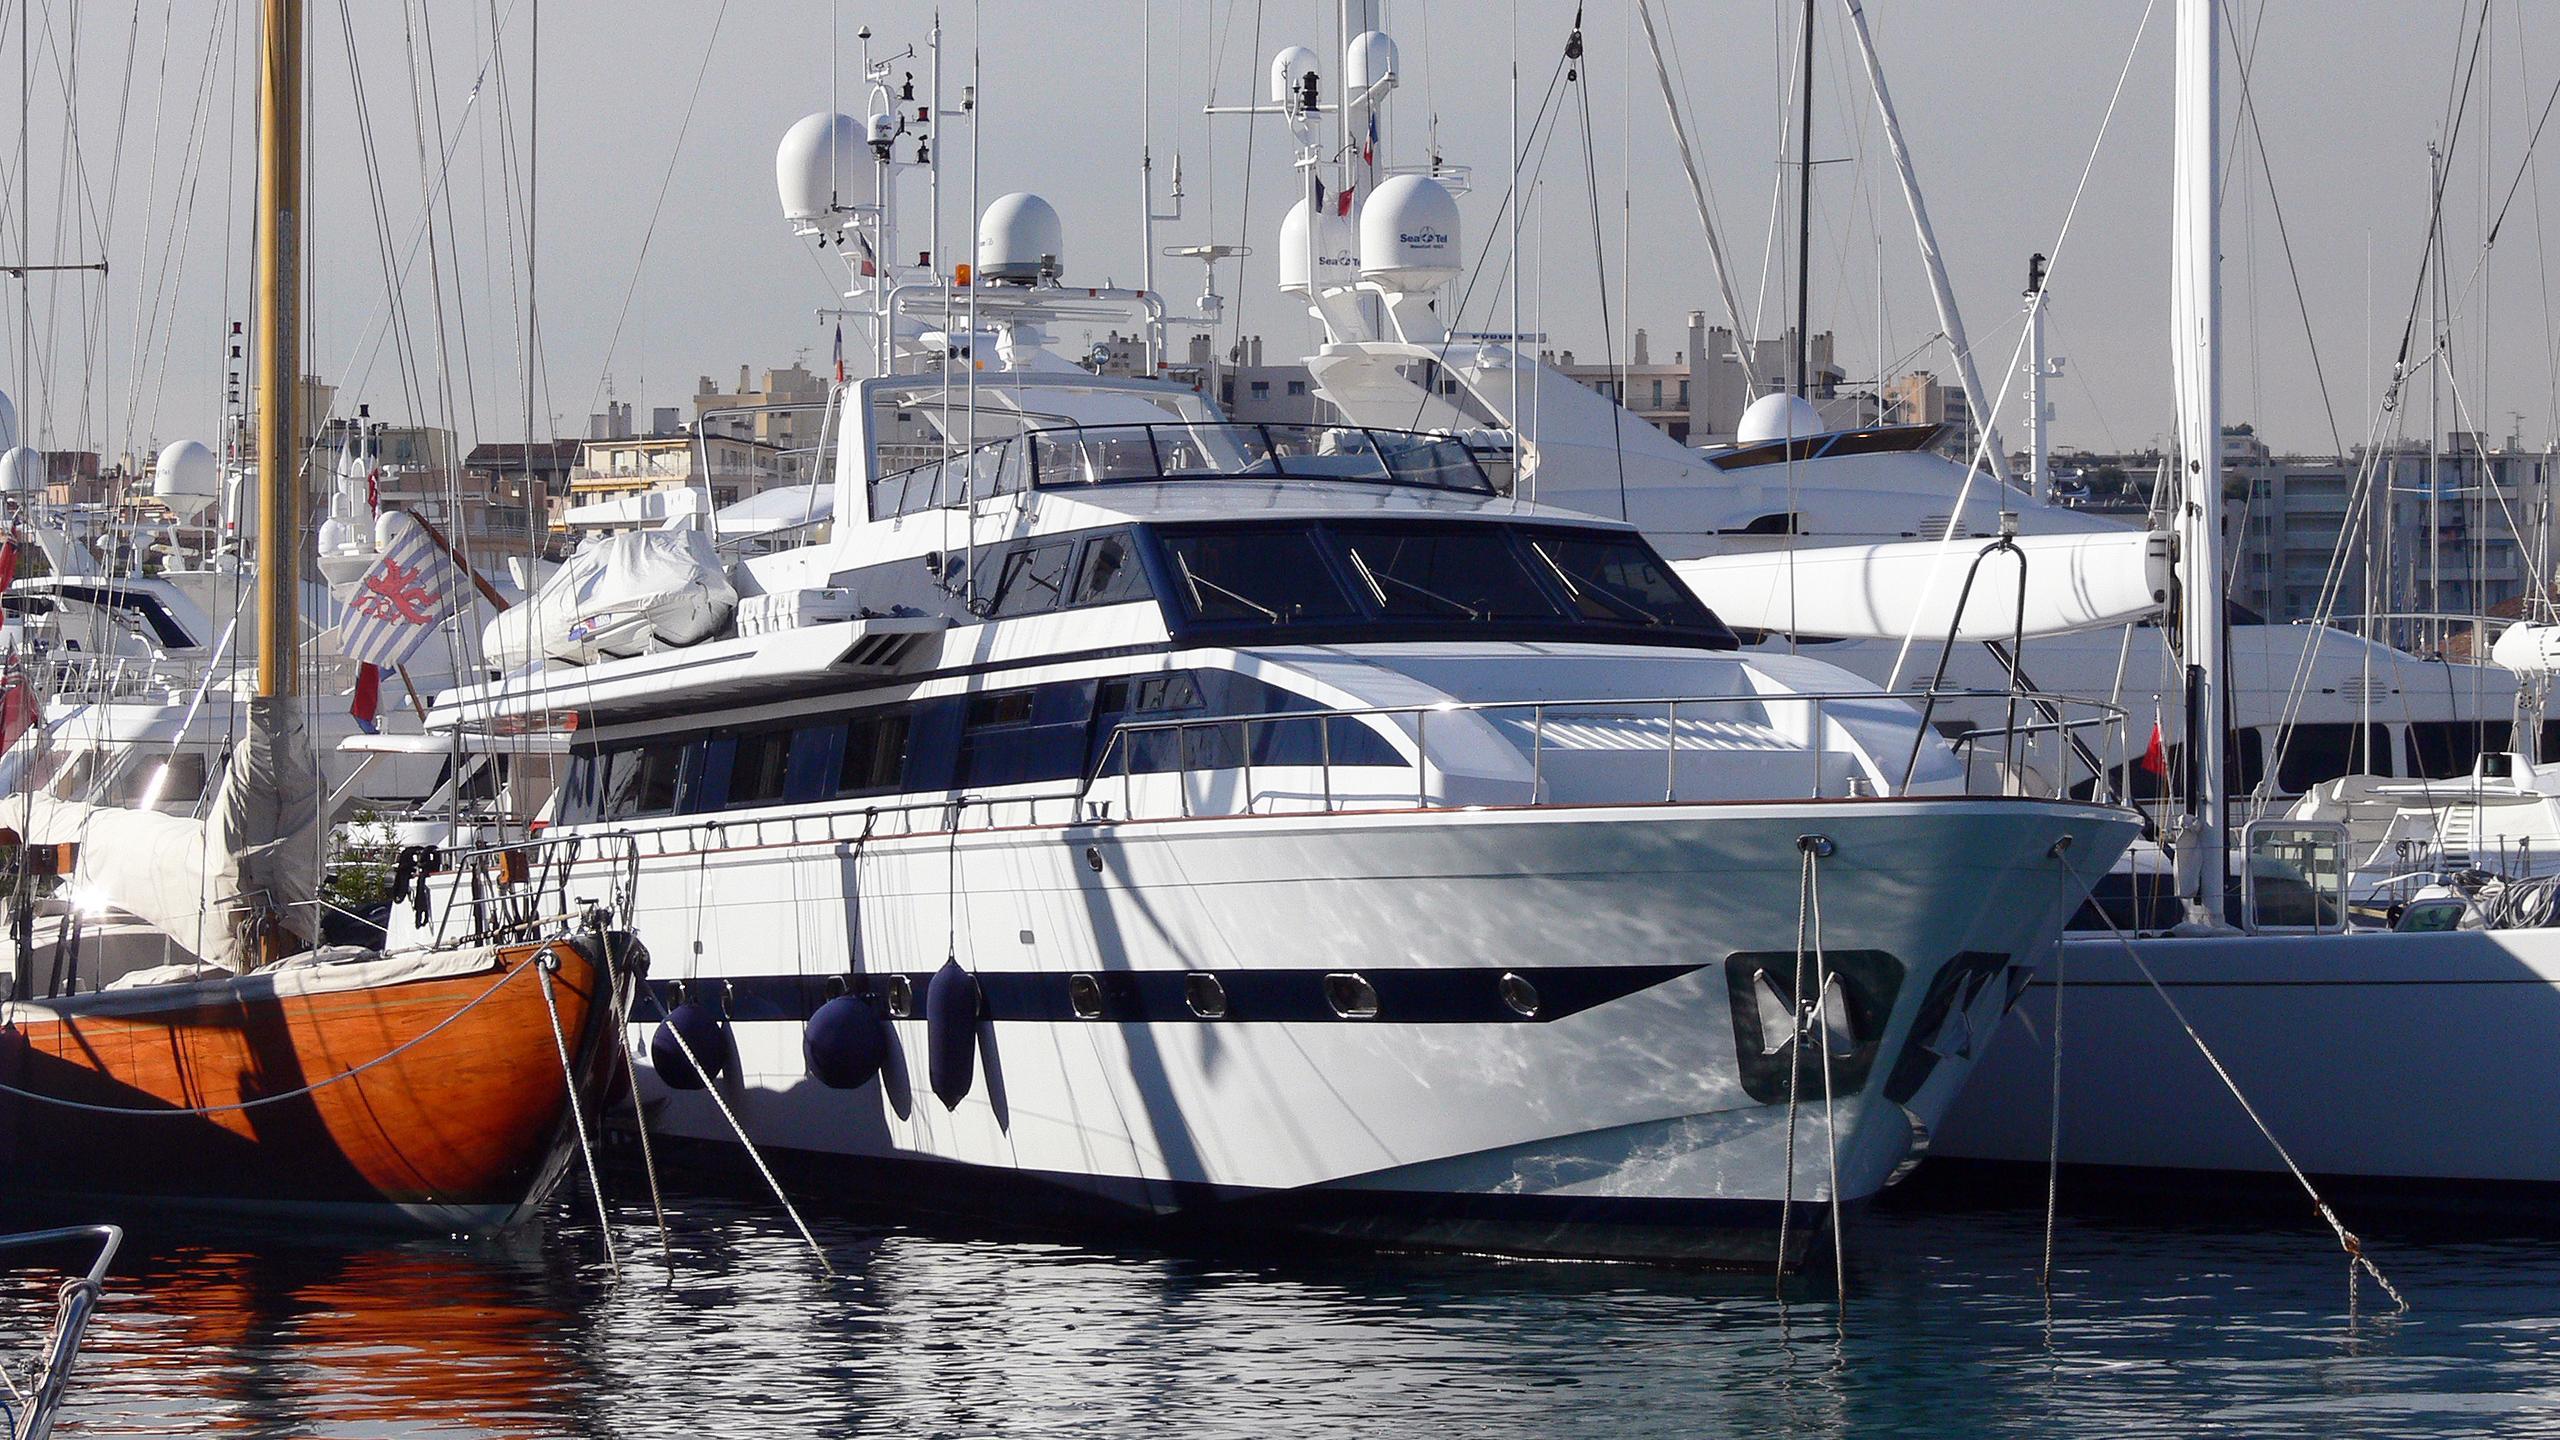 queen-south-motor-yacht-versilcraft-super-challenger-1987-30m-bow